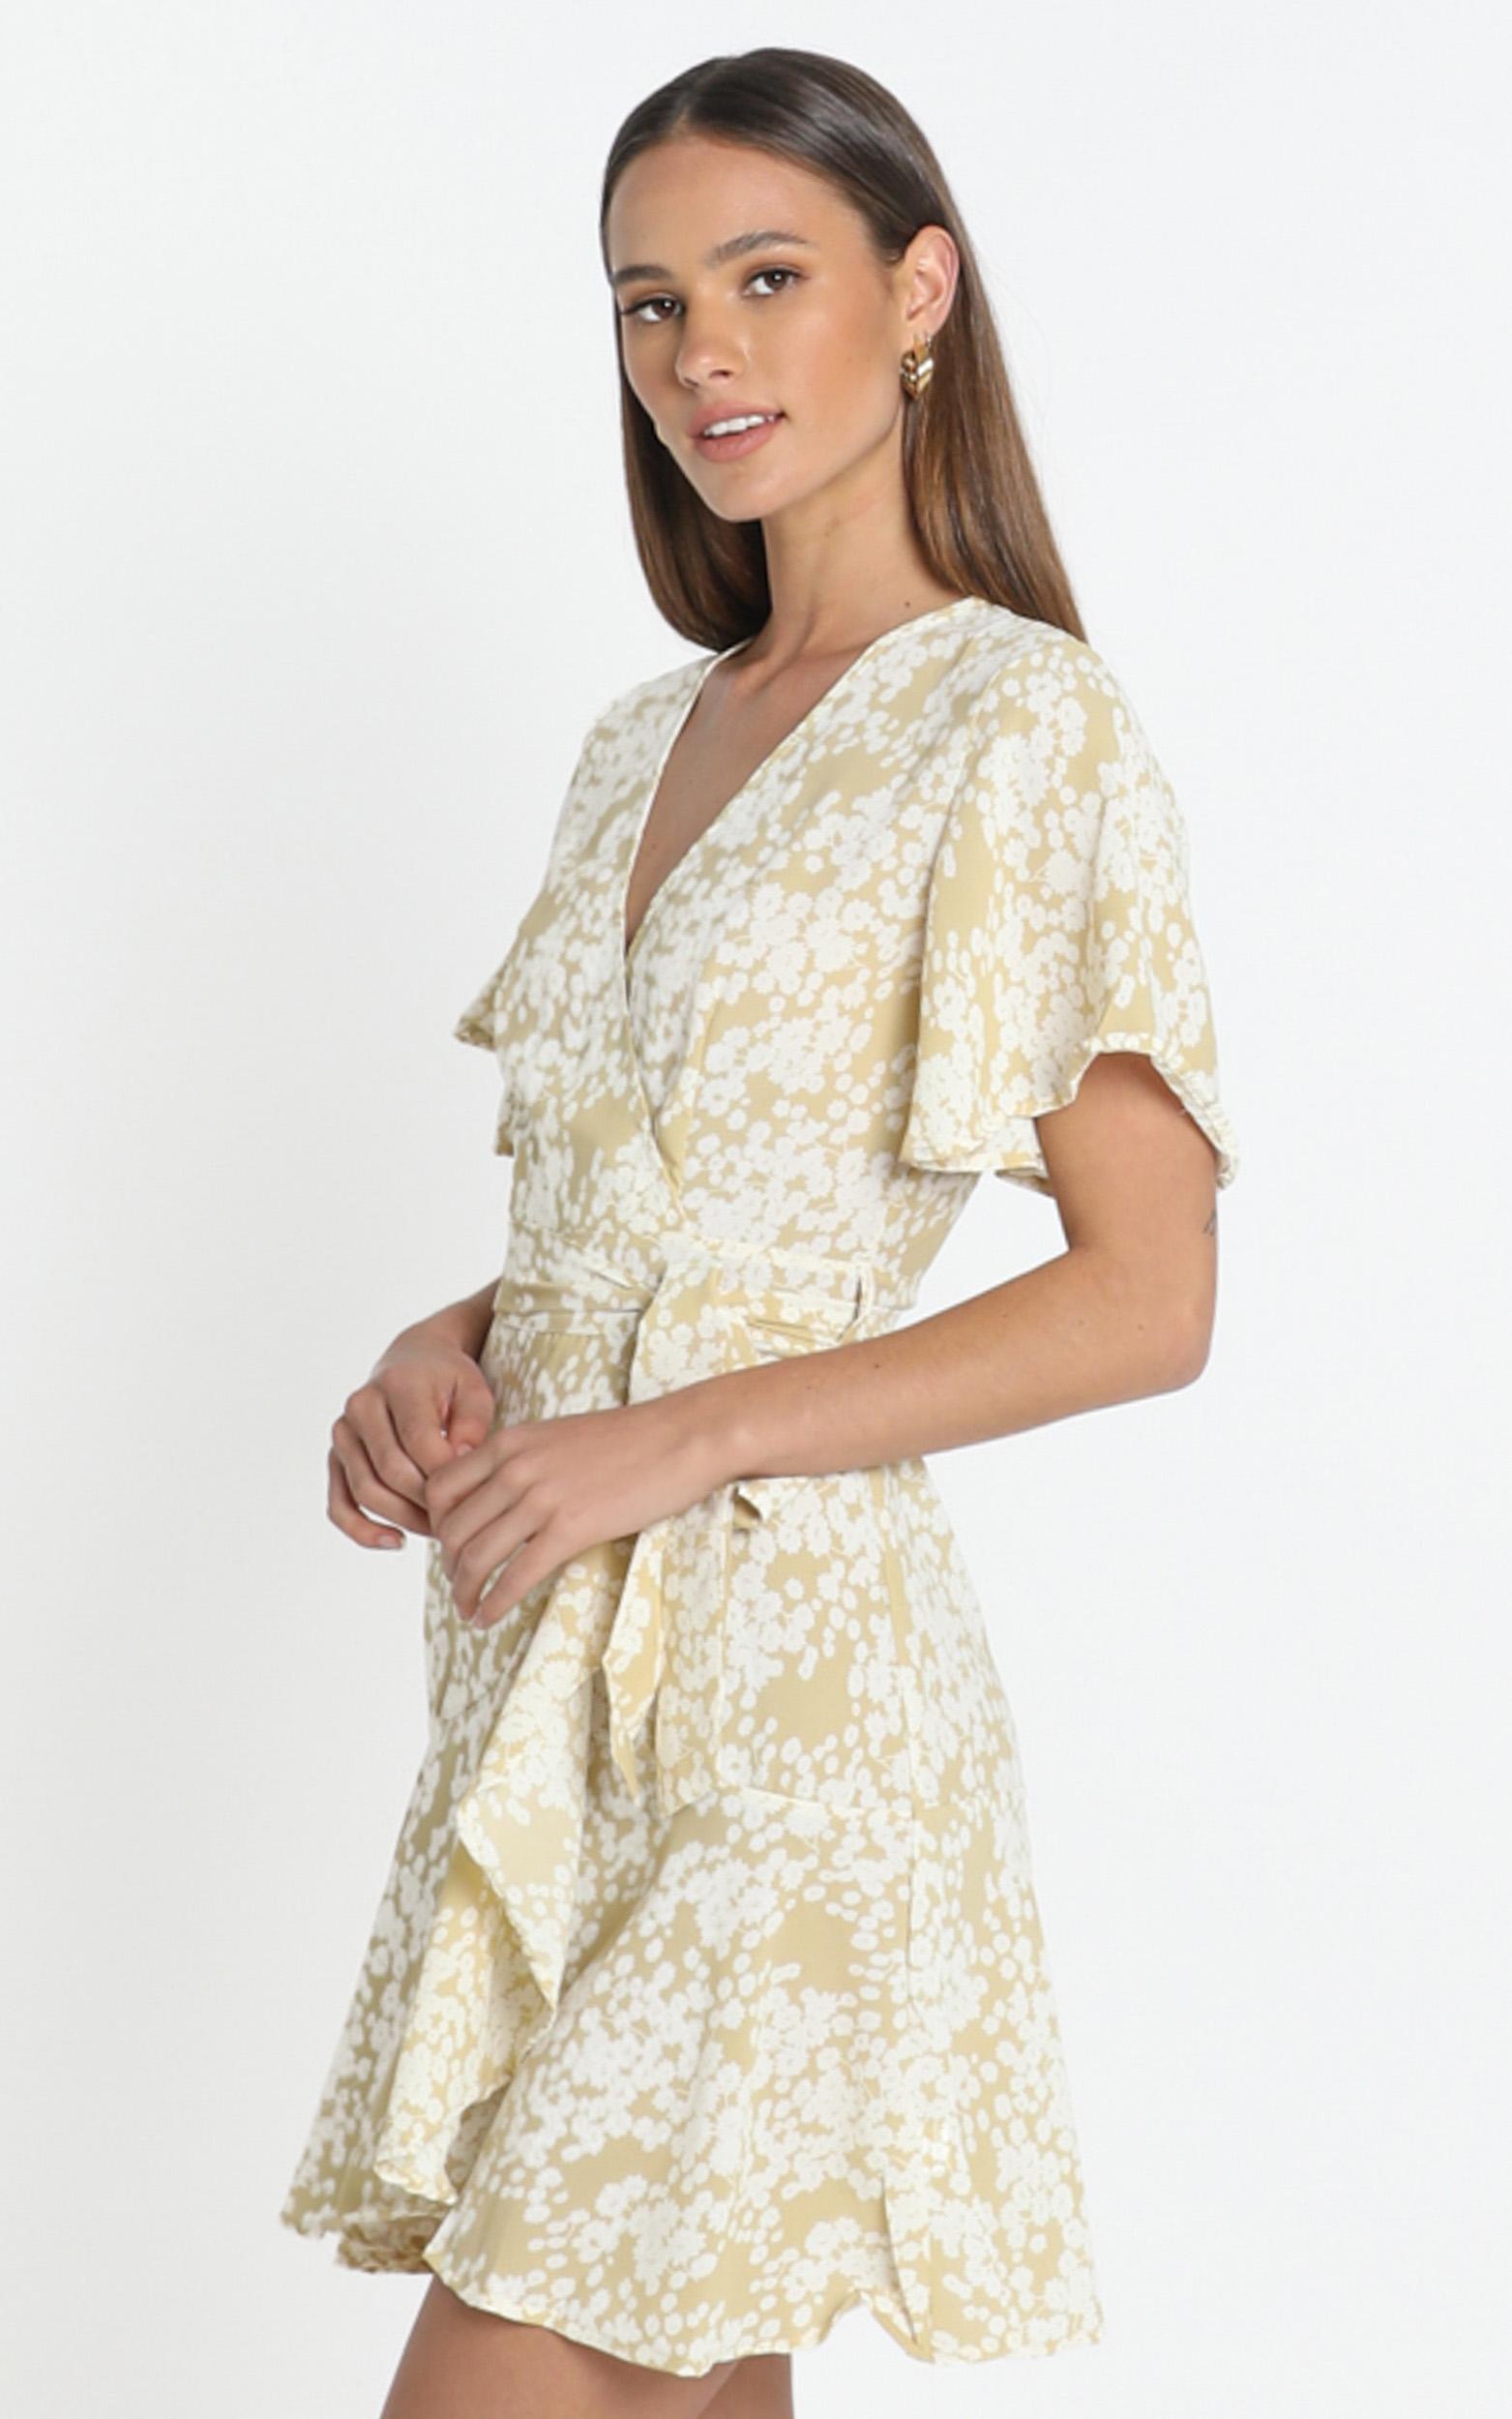 Aryana Dress in Beige Floral - 14 (XL), Beige, hi-res image number null